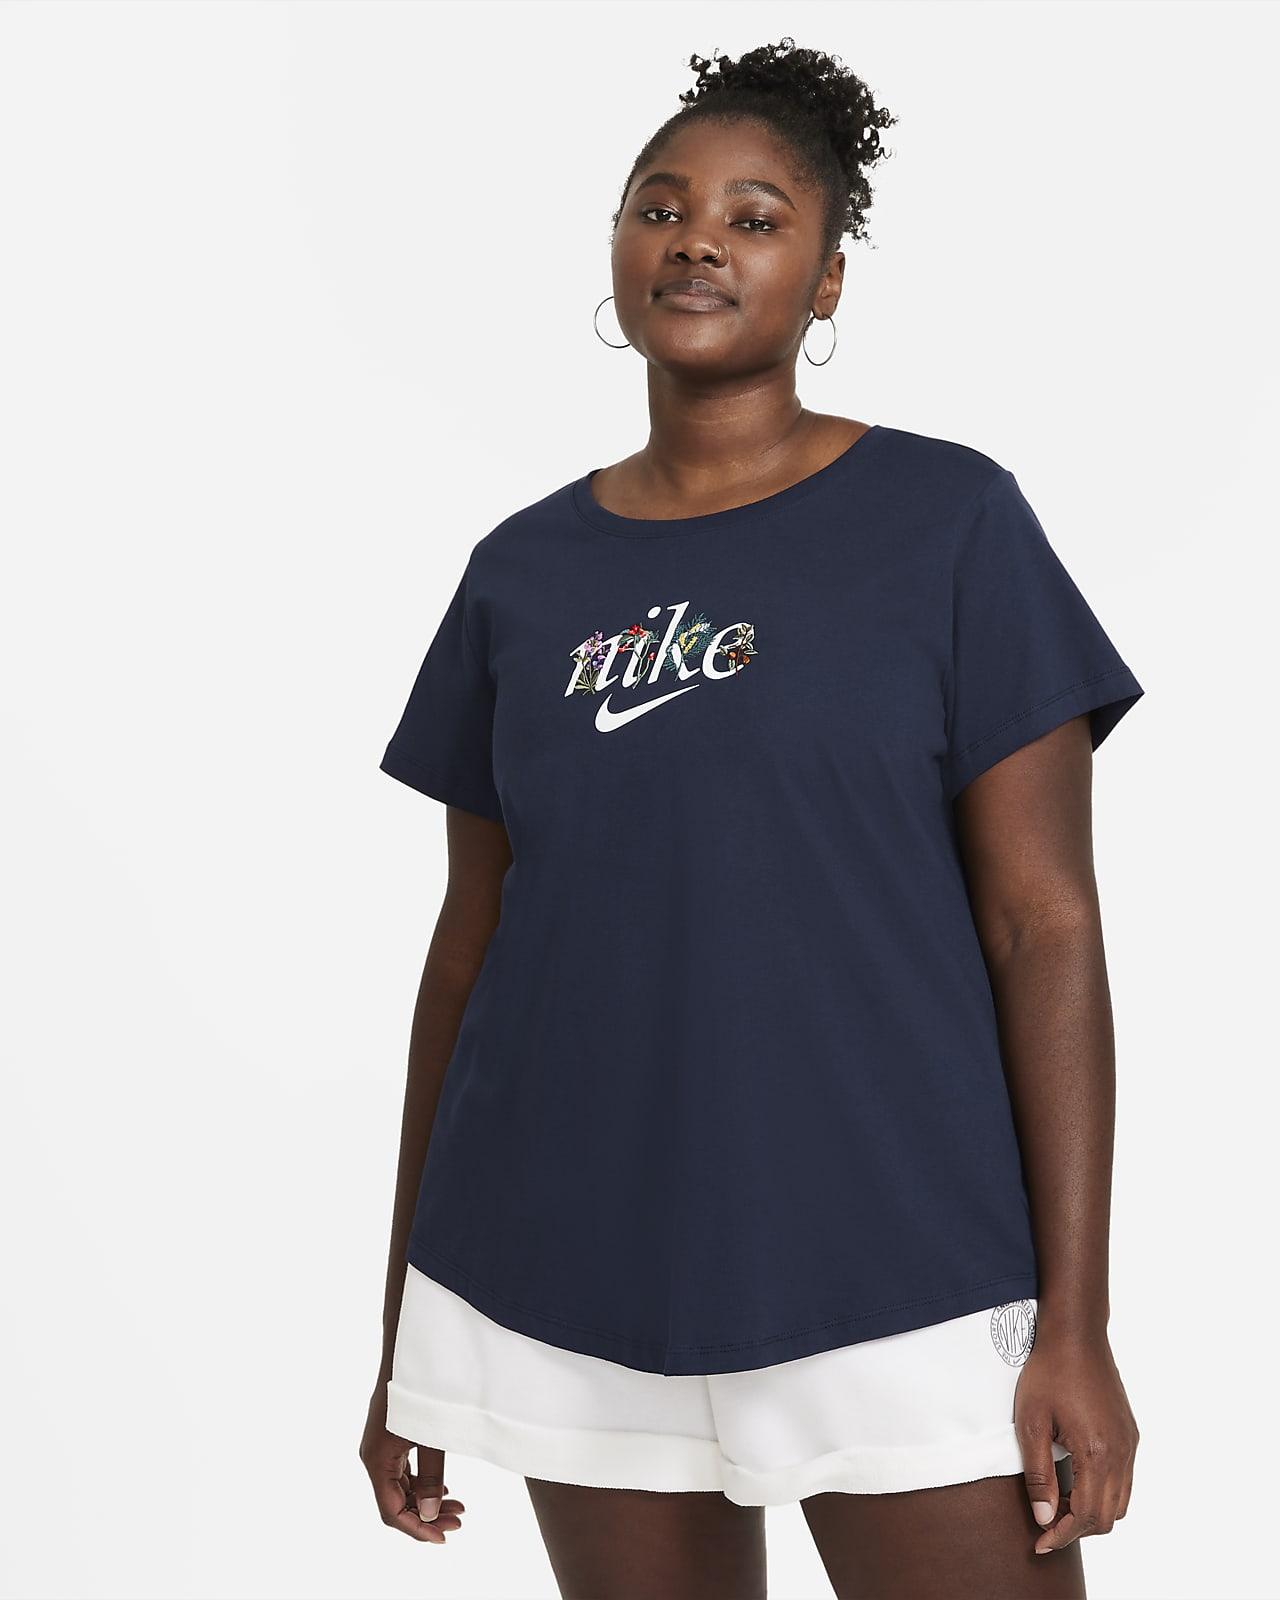 Tee-shirt Nike Sportswear pour Femme (grande taille)